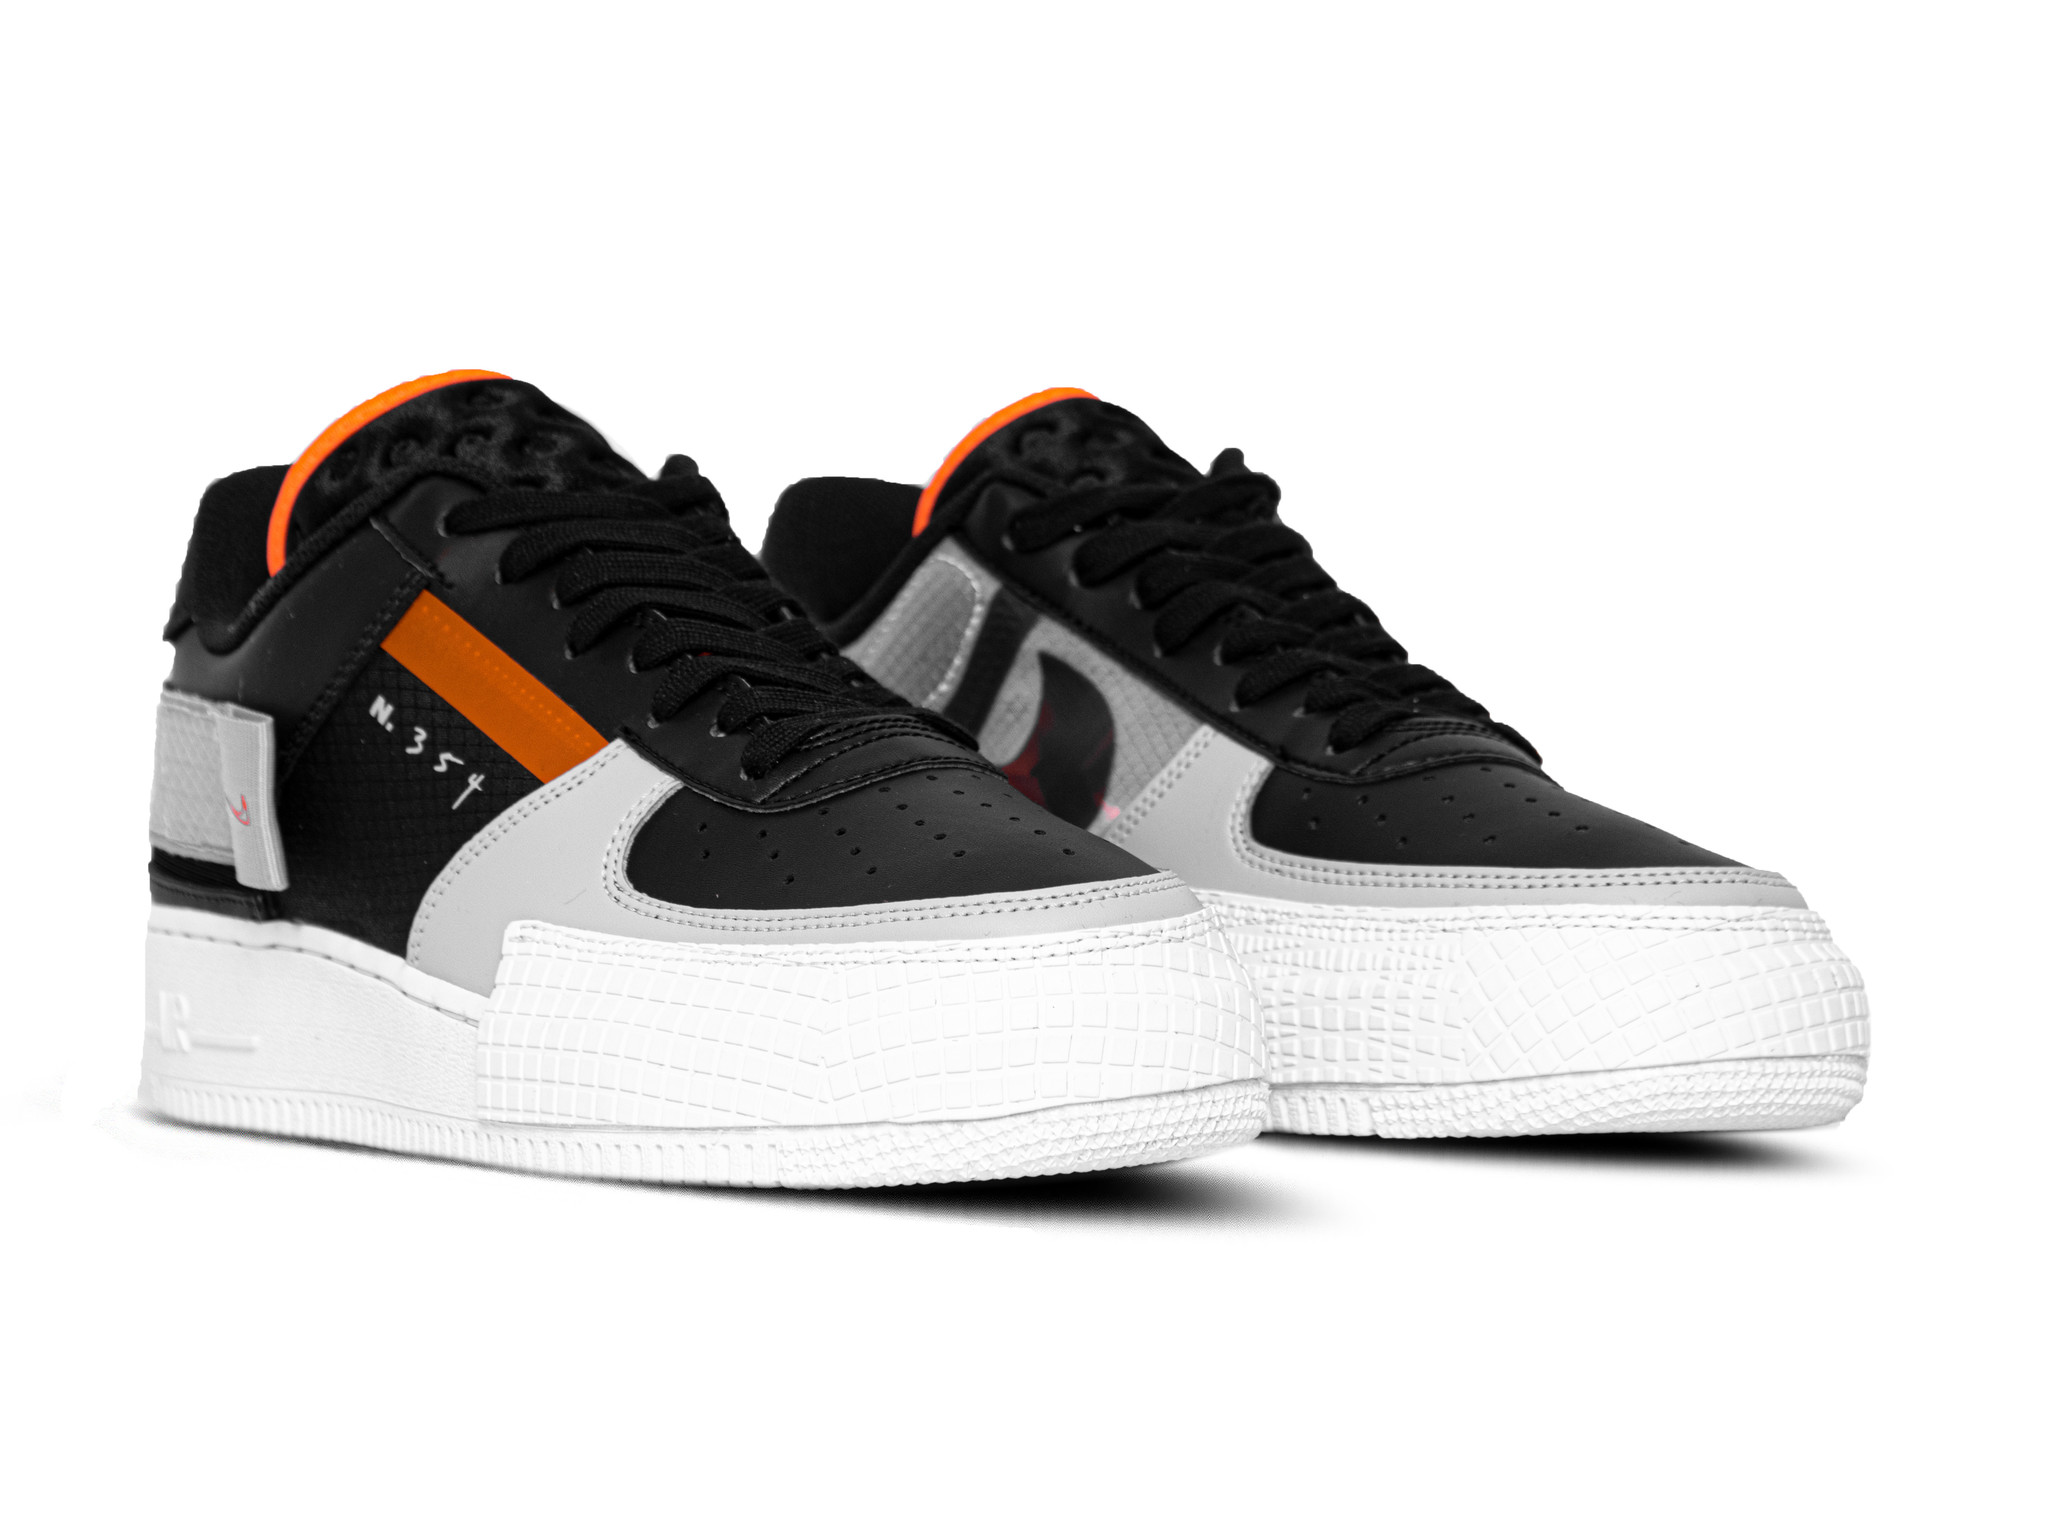 Nike Air Force 1 Type Shoes BlackWolf GreyWhiteHyper